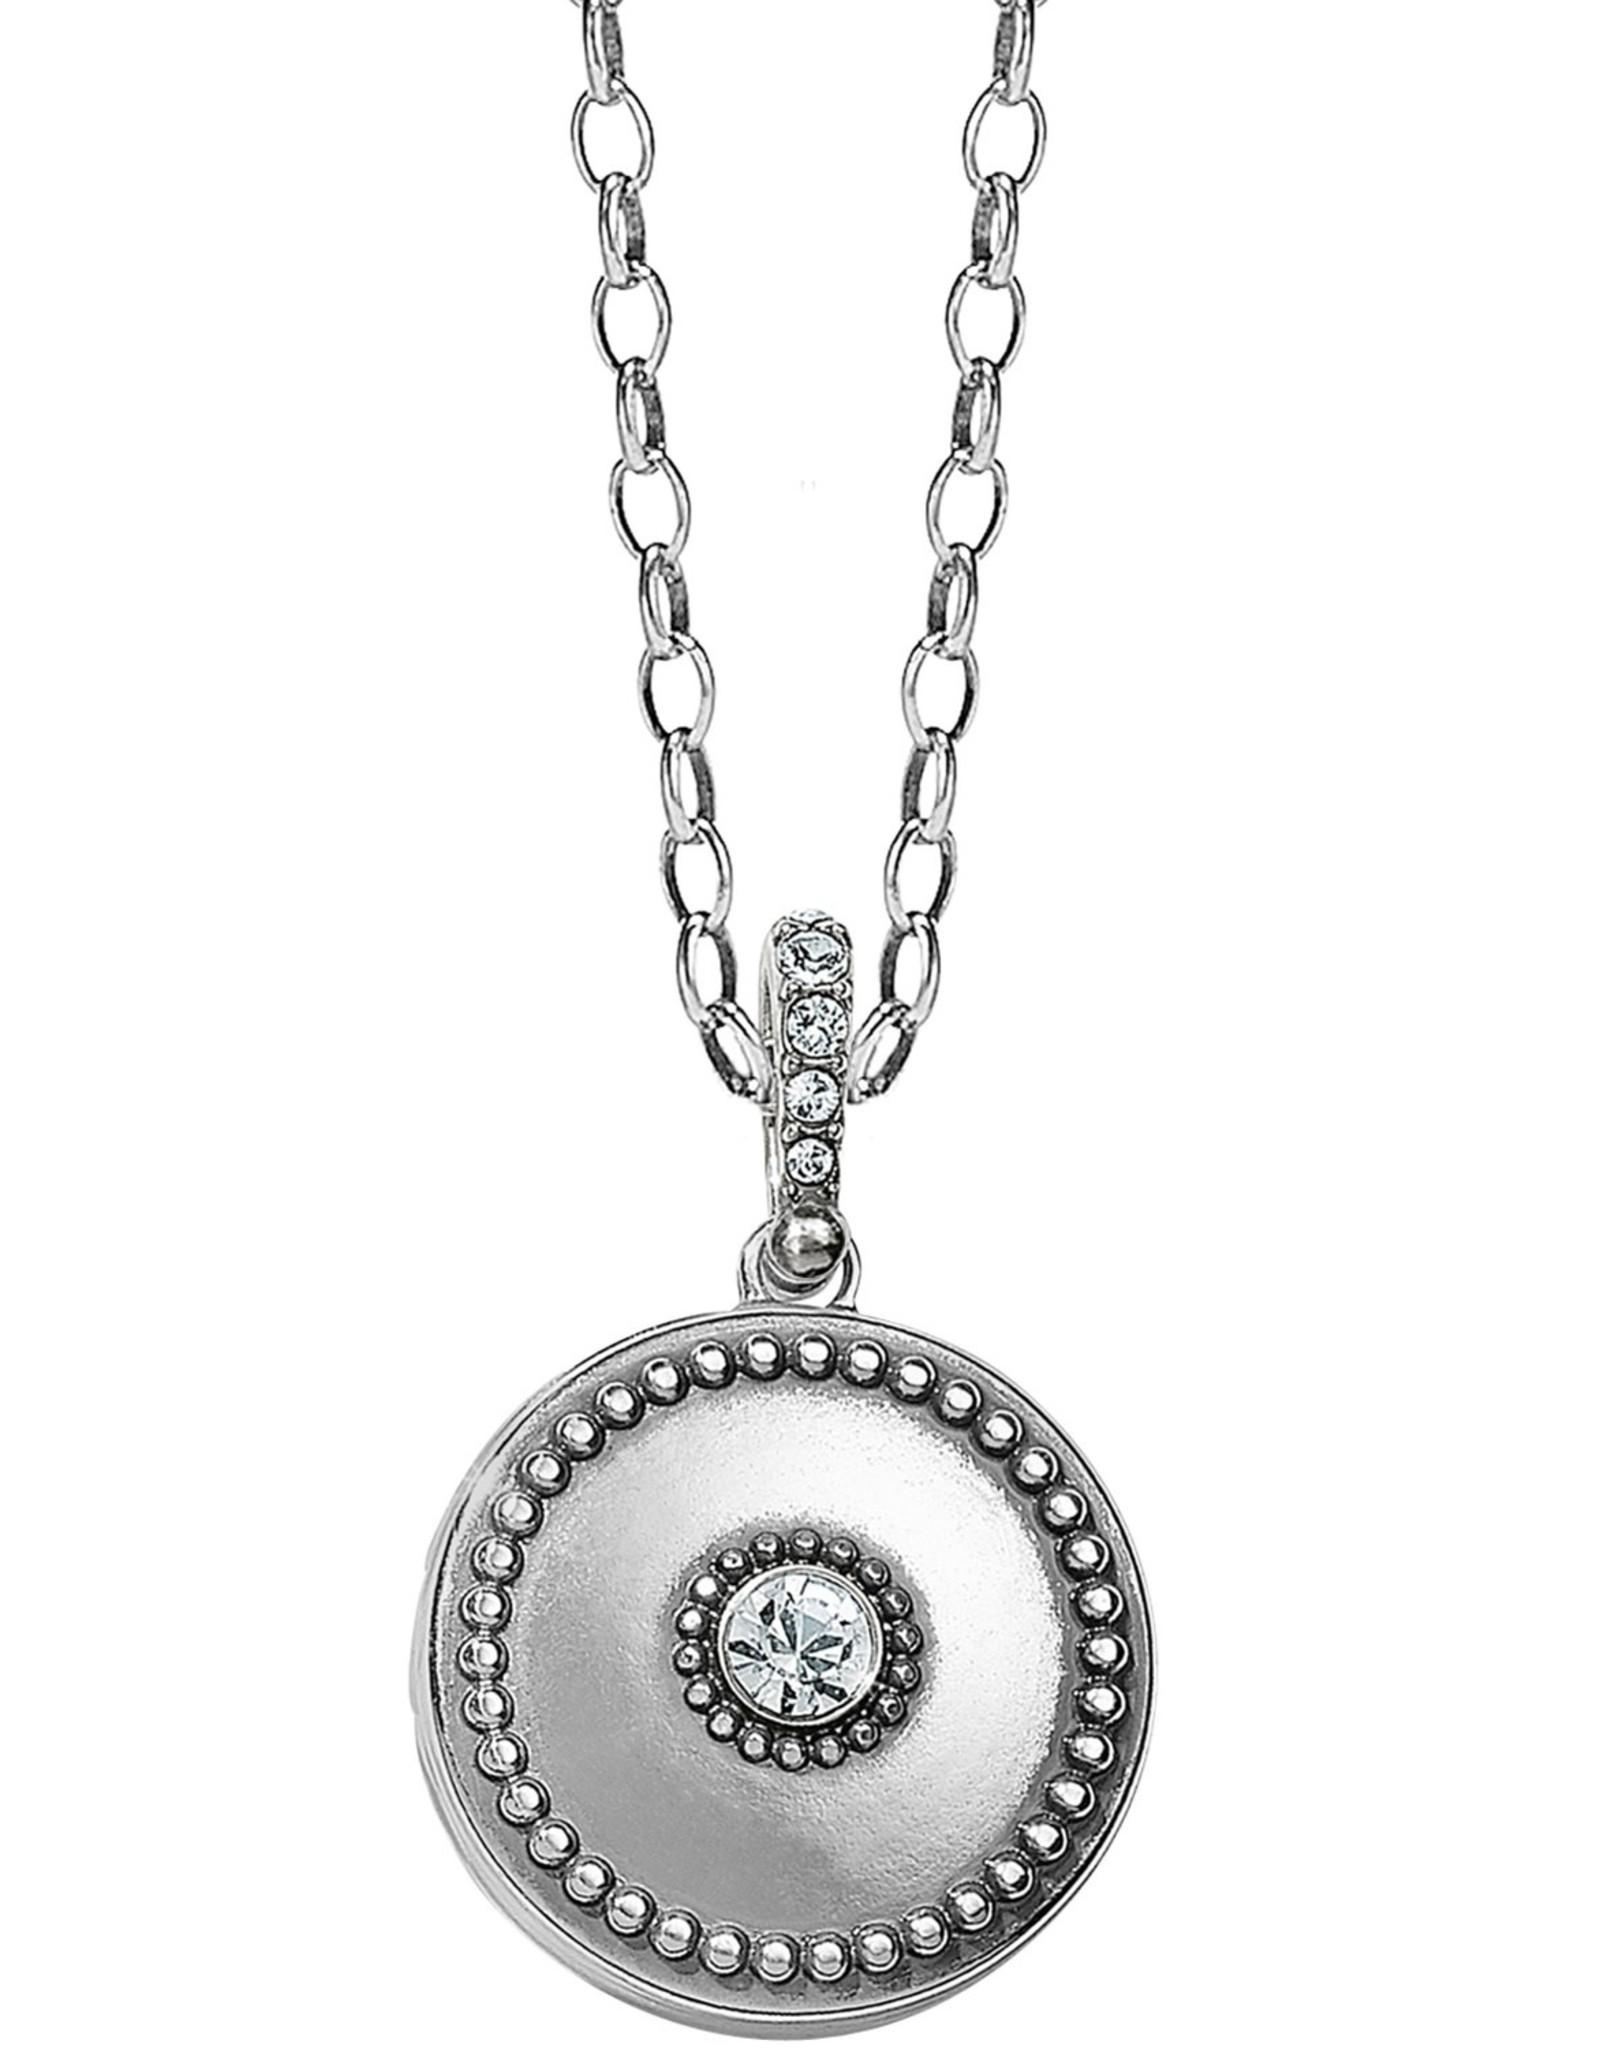 Brighton Brighton Twinkle Small Round Double Locket Necklace